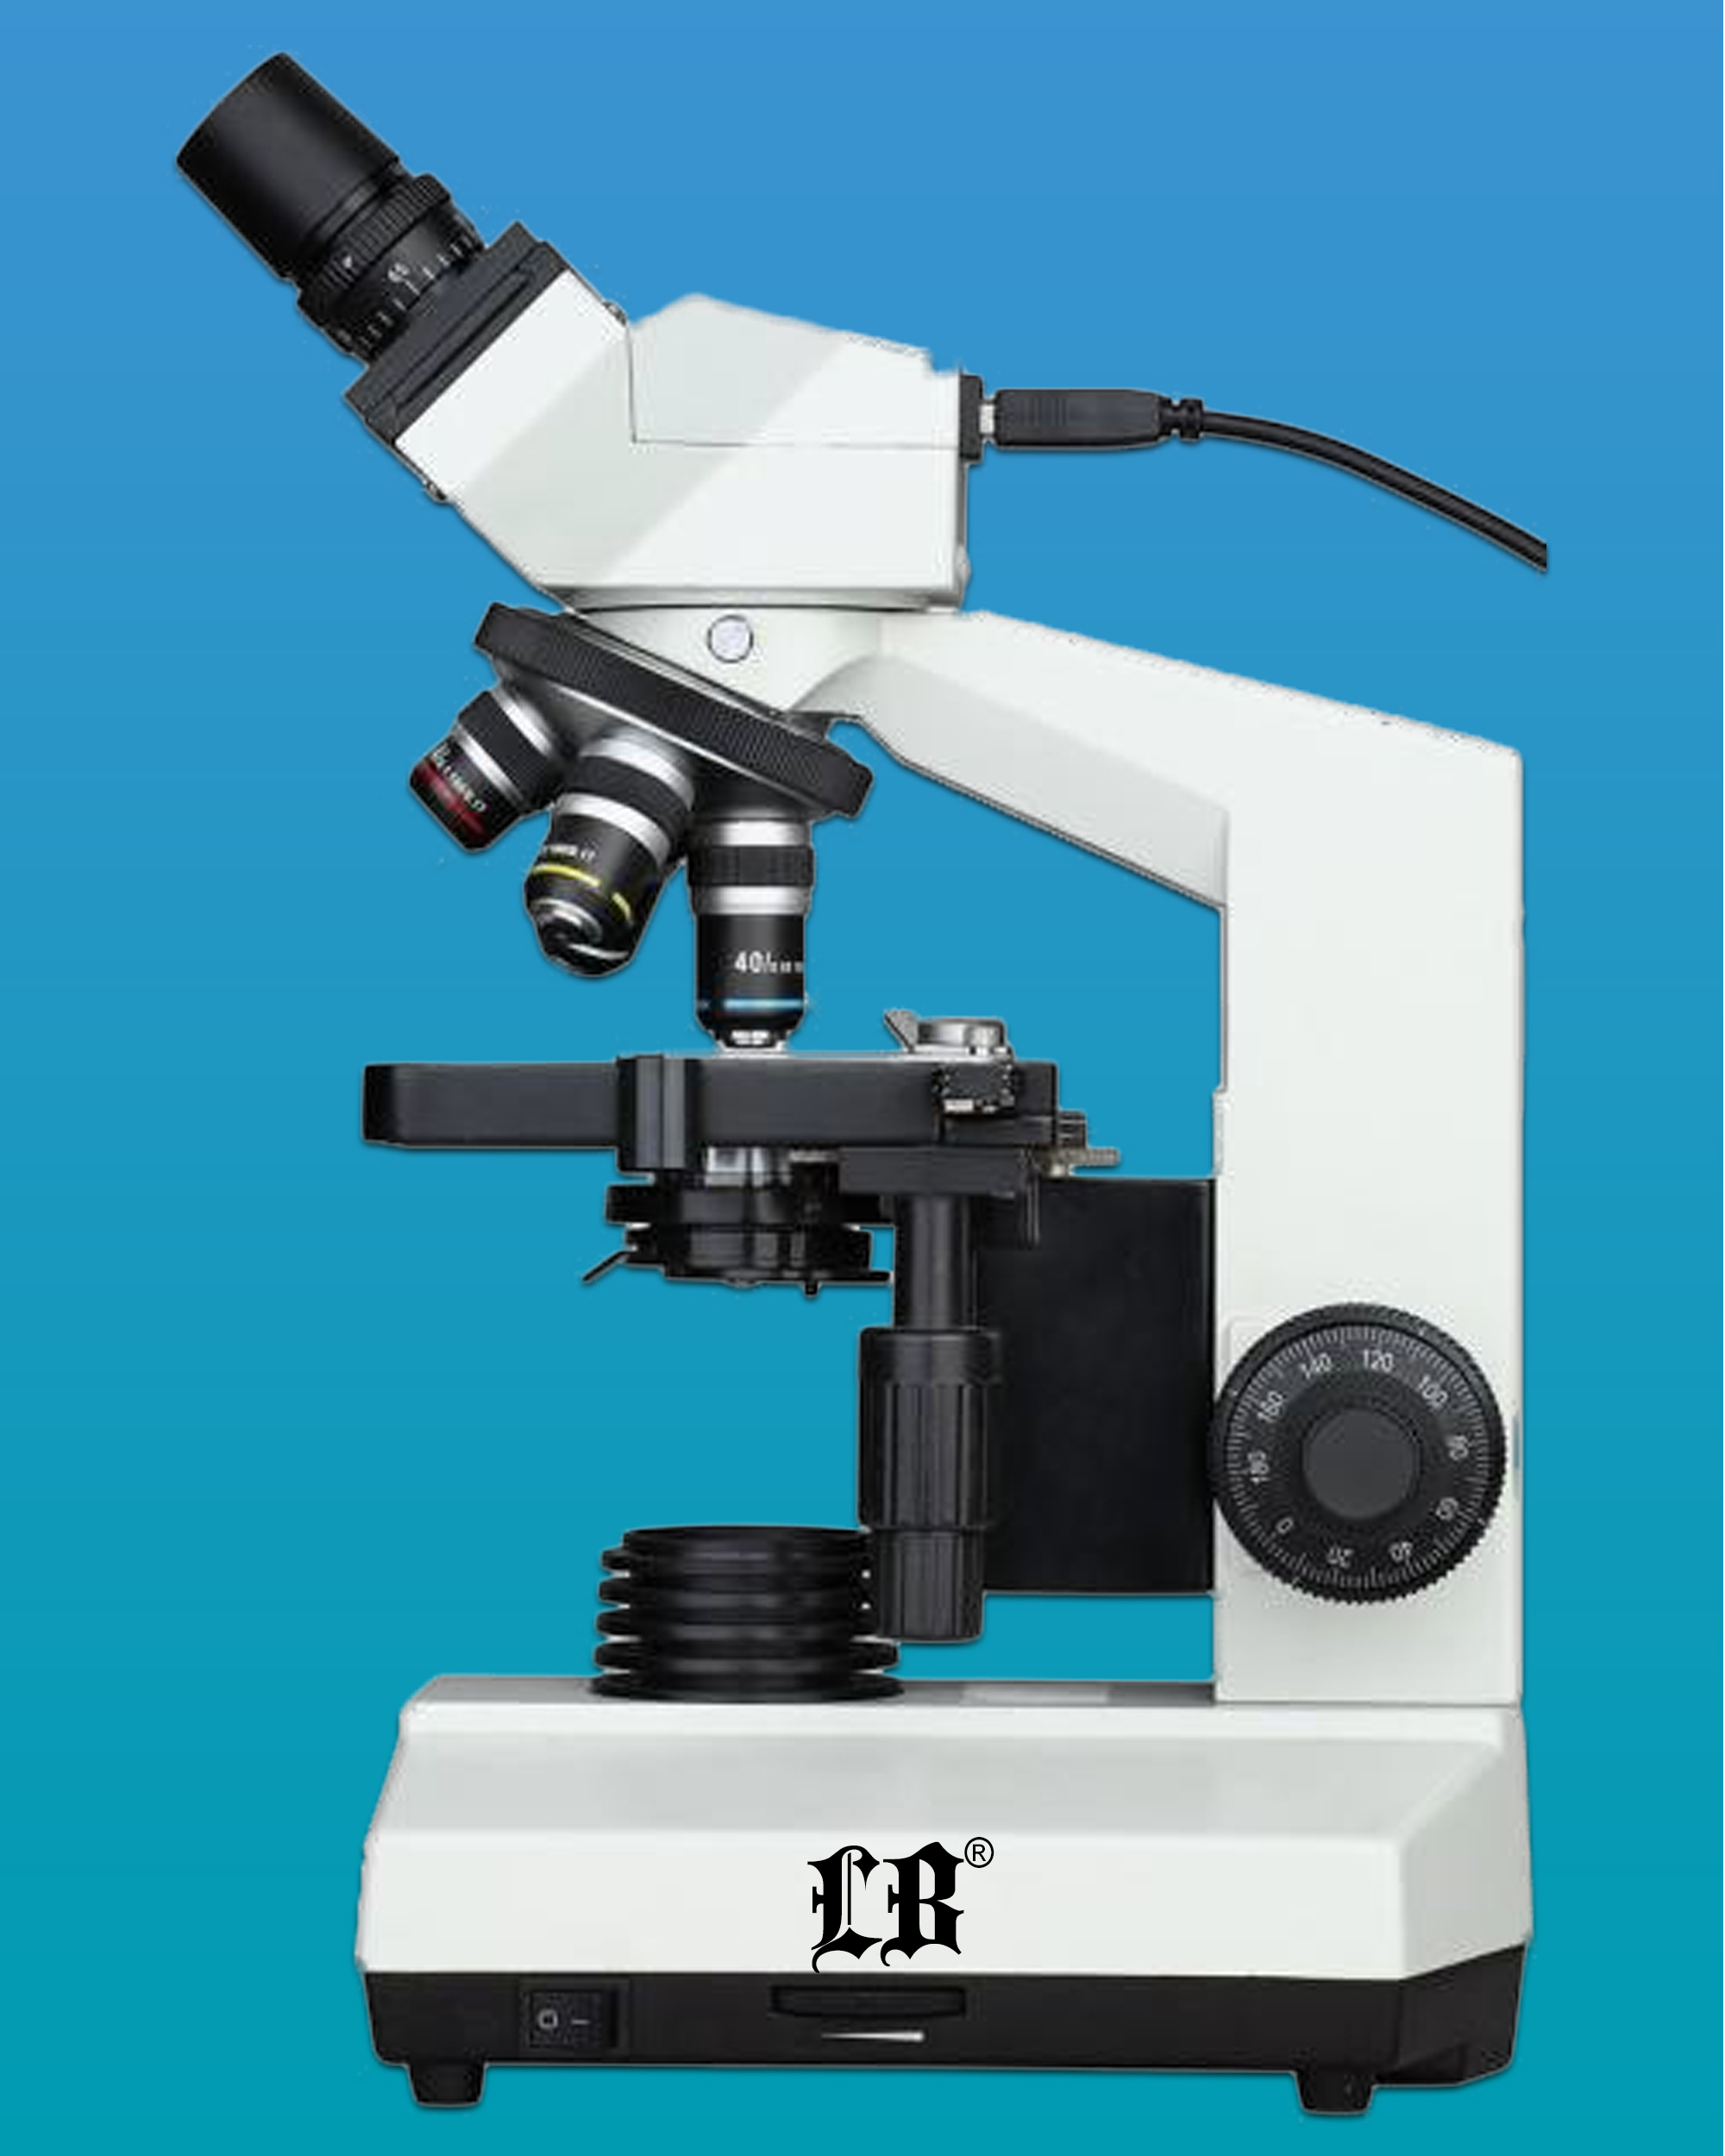 [LB-230] Binocular Biological Digital Microscope w/ LED Illumination & 1.3 MP Camera